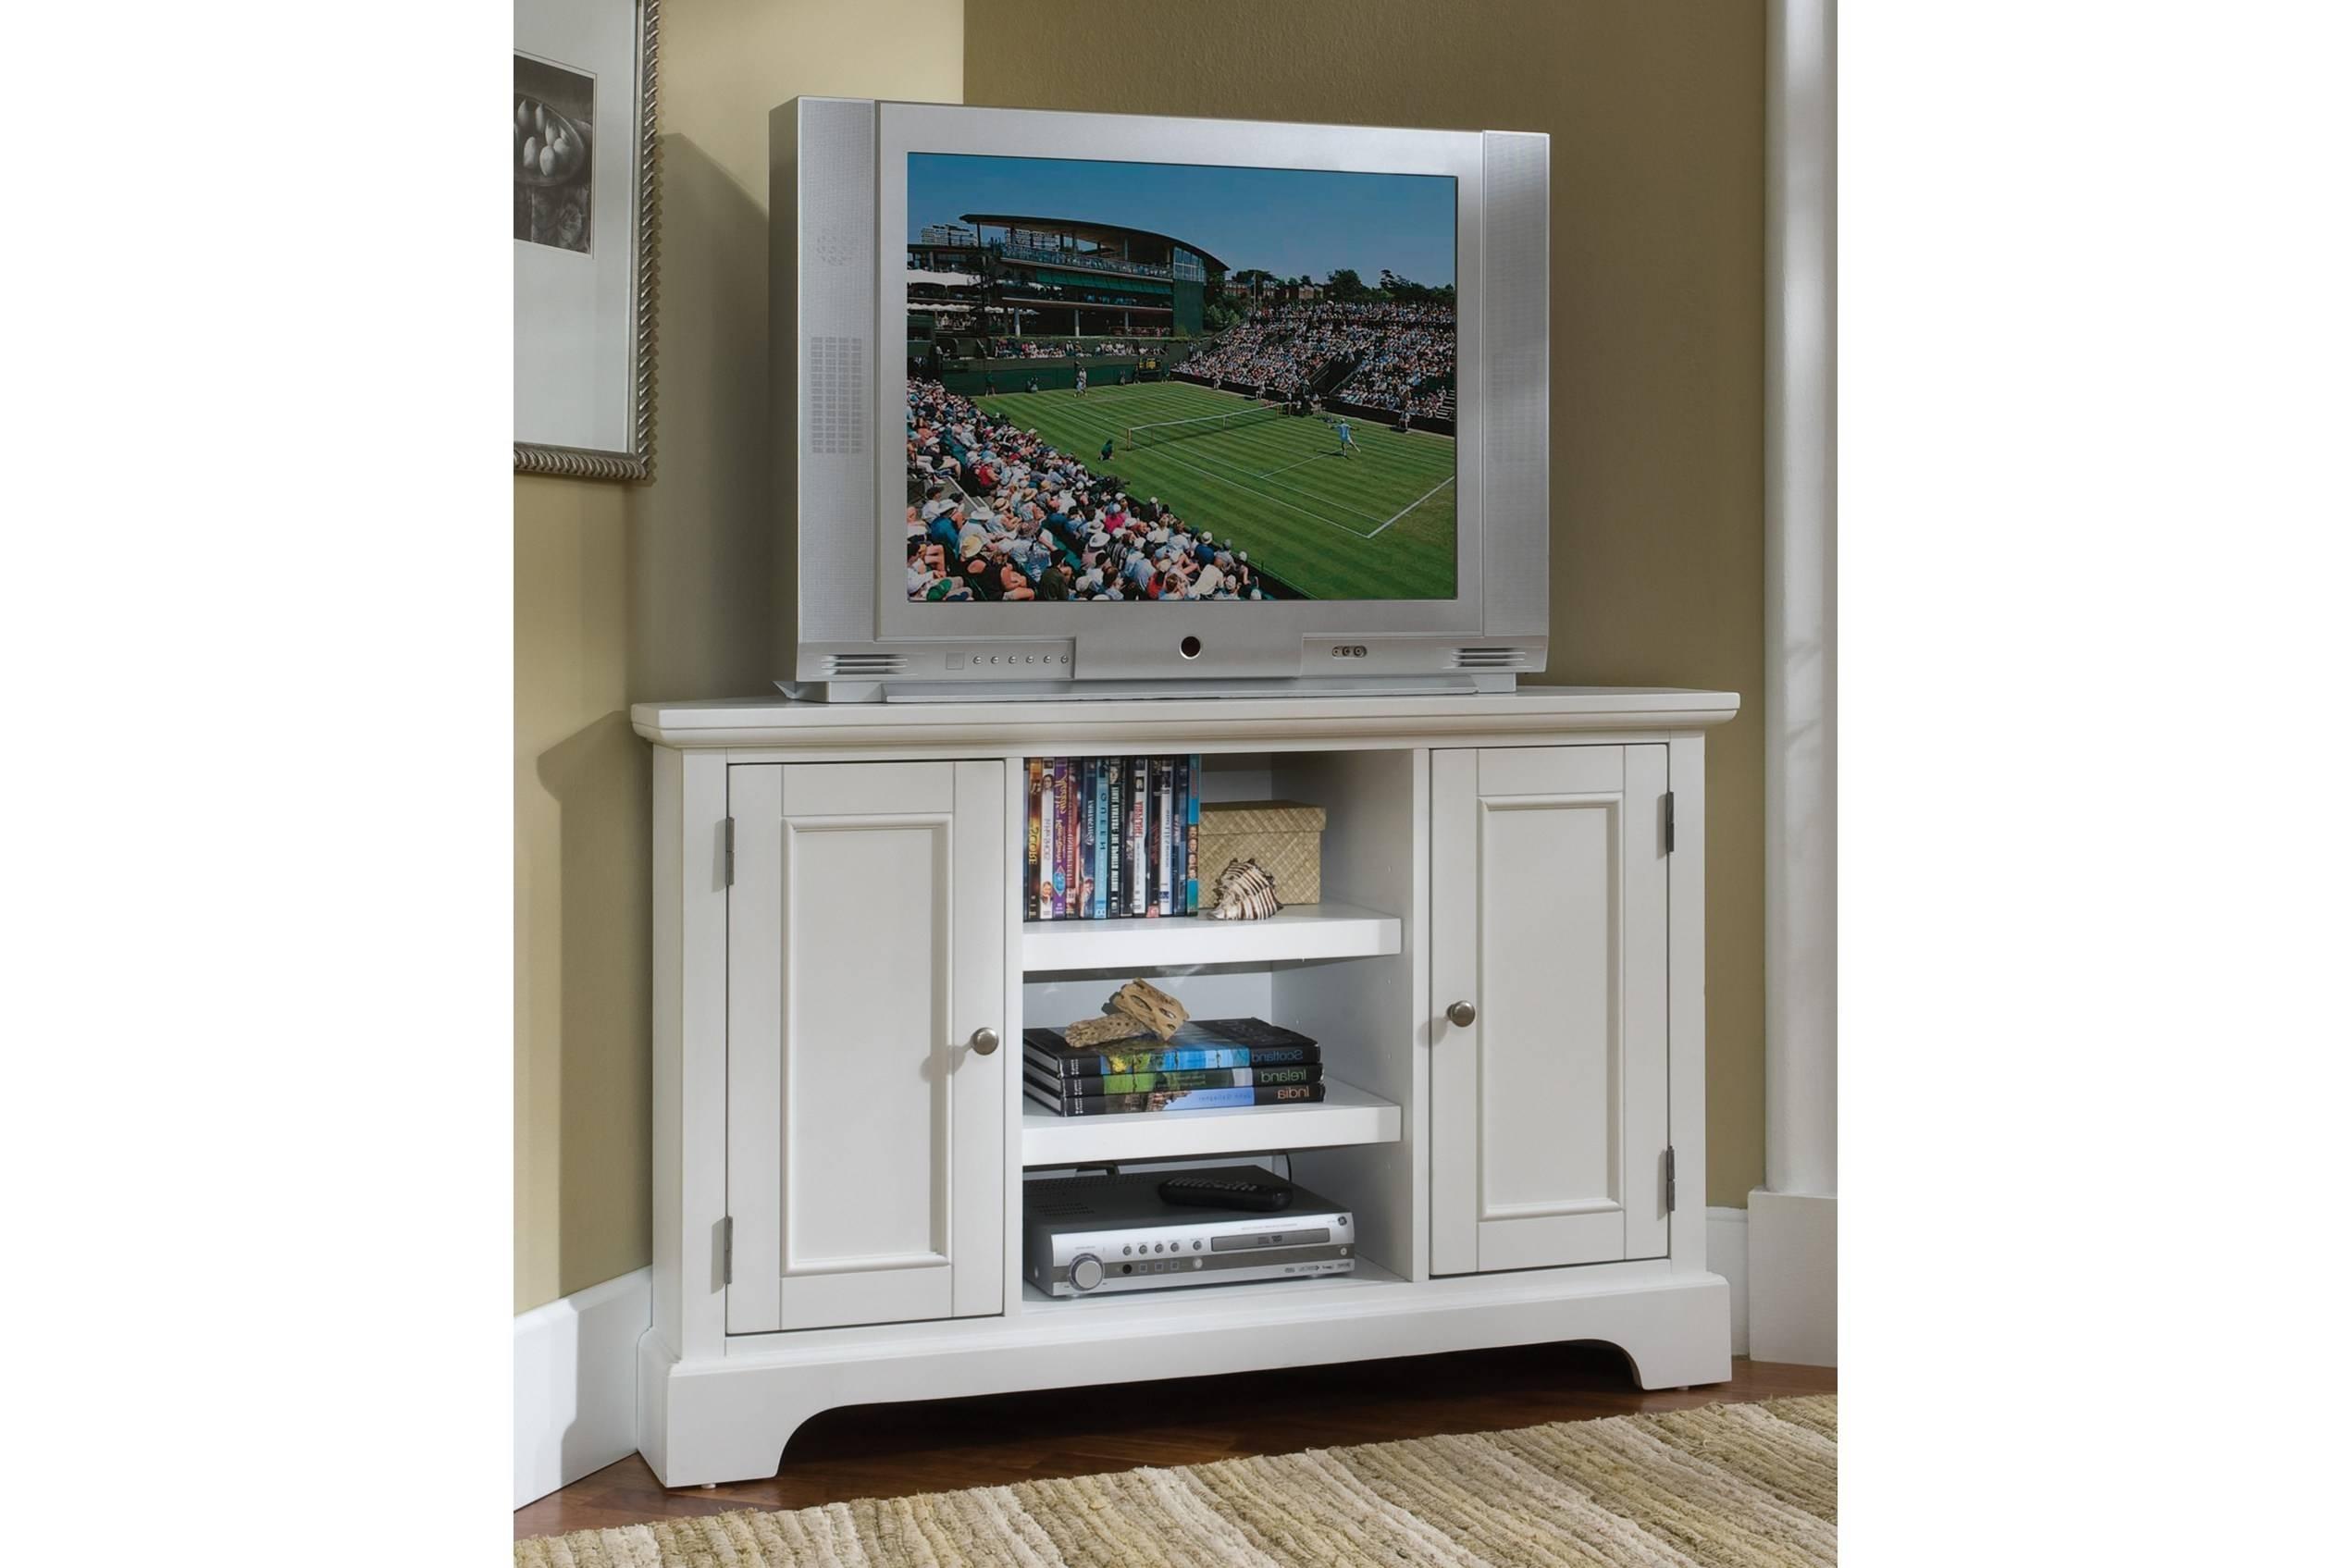 Flat Screen Tv Corner Cabinets With Doors • Cabinet Doors Within Corner Tv Cabinets For Flat Screens With Doors (View 5 of 15)